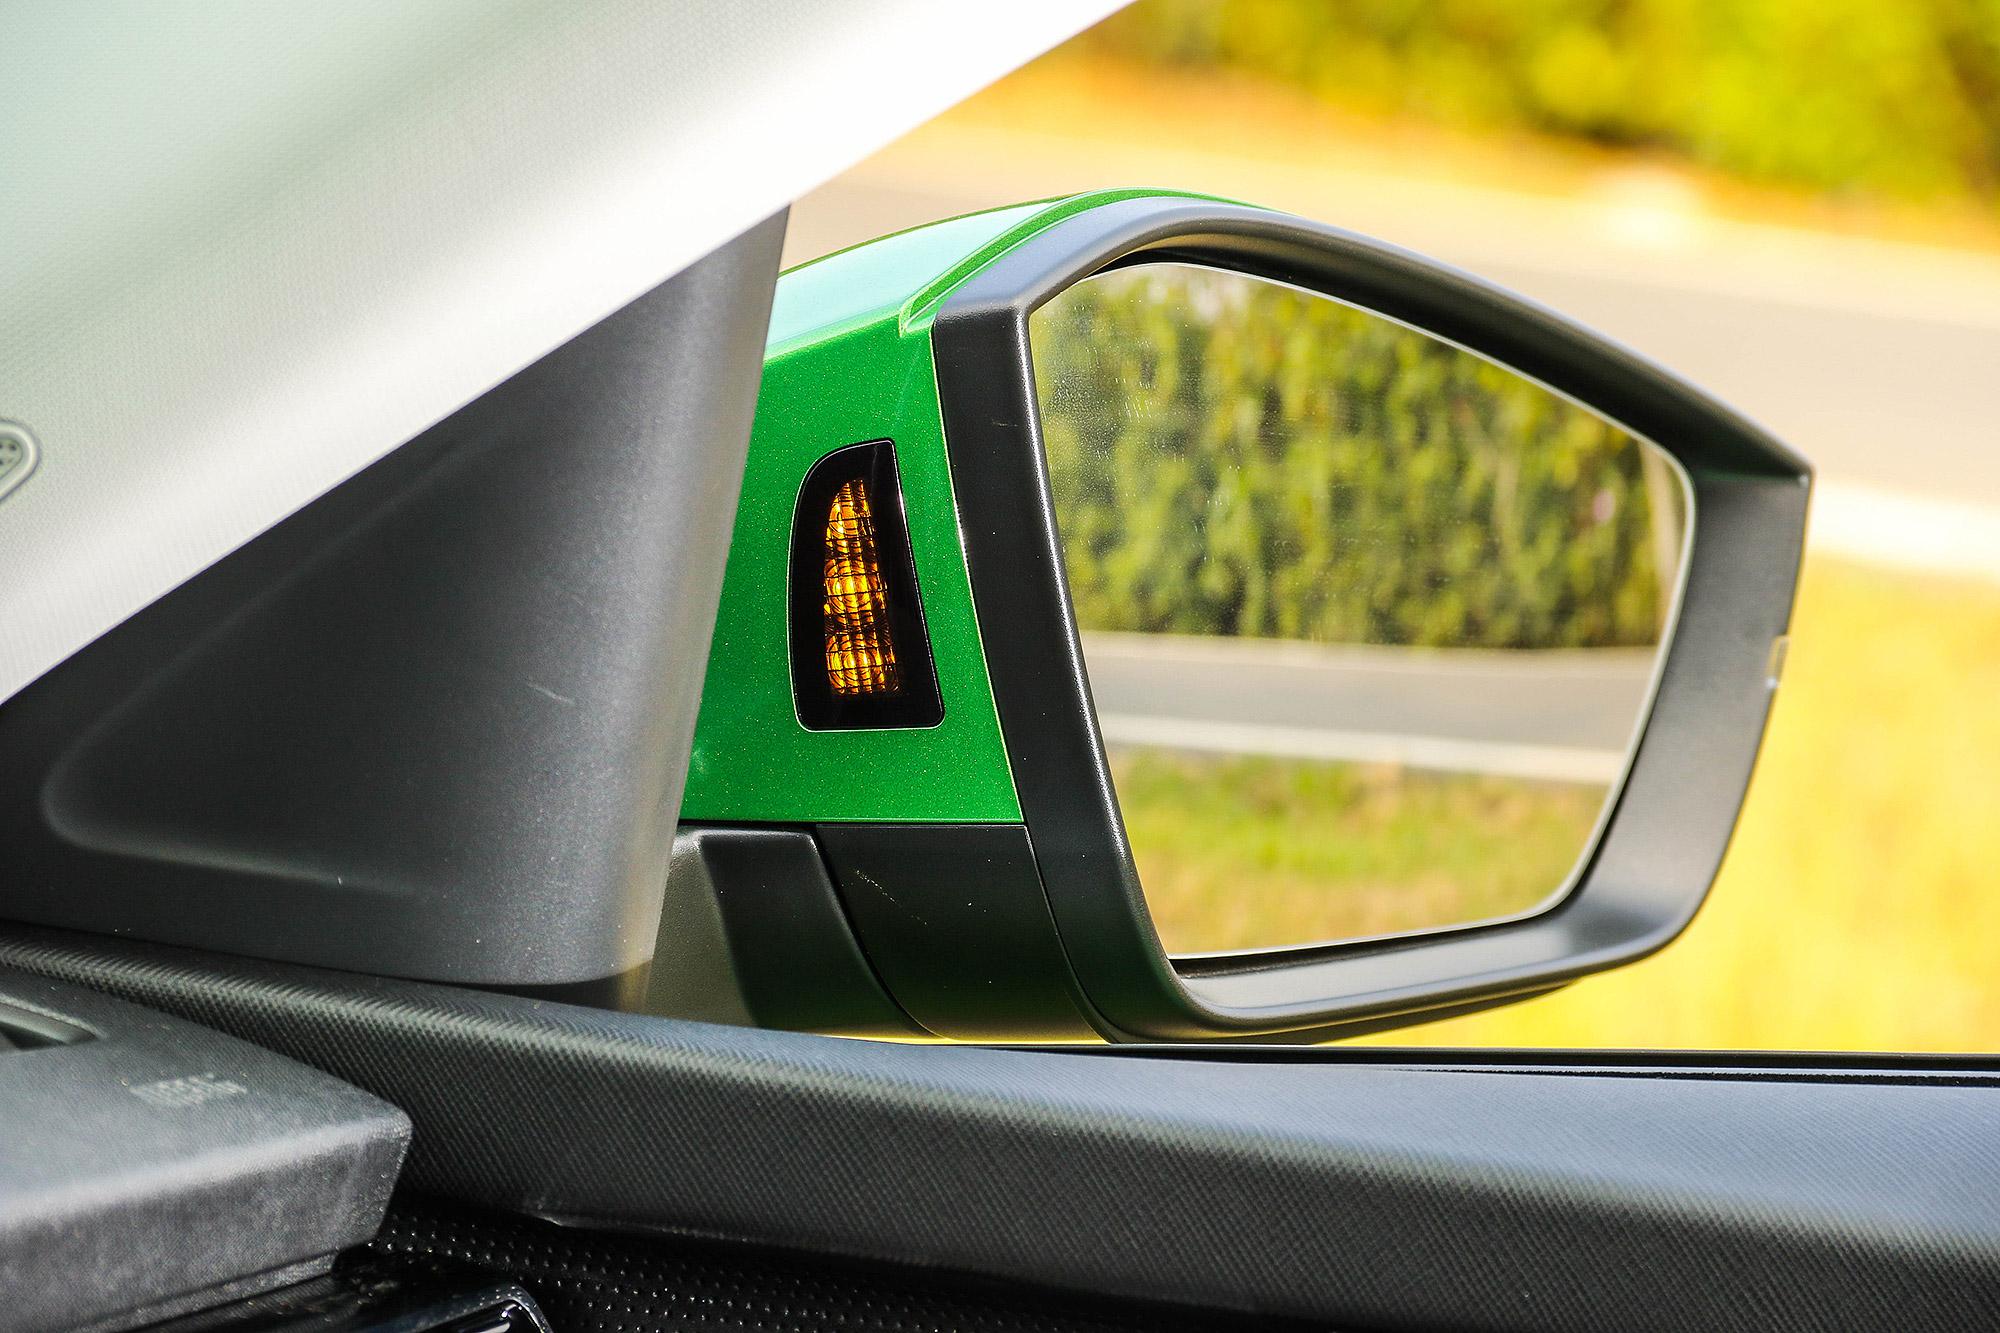 Side Assist 不但偵測距離可達 70 公尺,位於後視鏡內側的警示燈號辨識度也較為清晰。